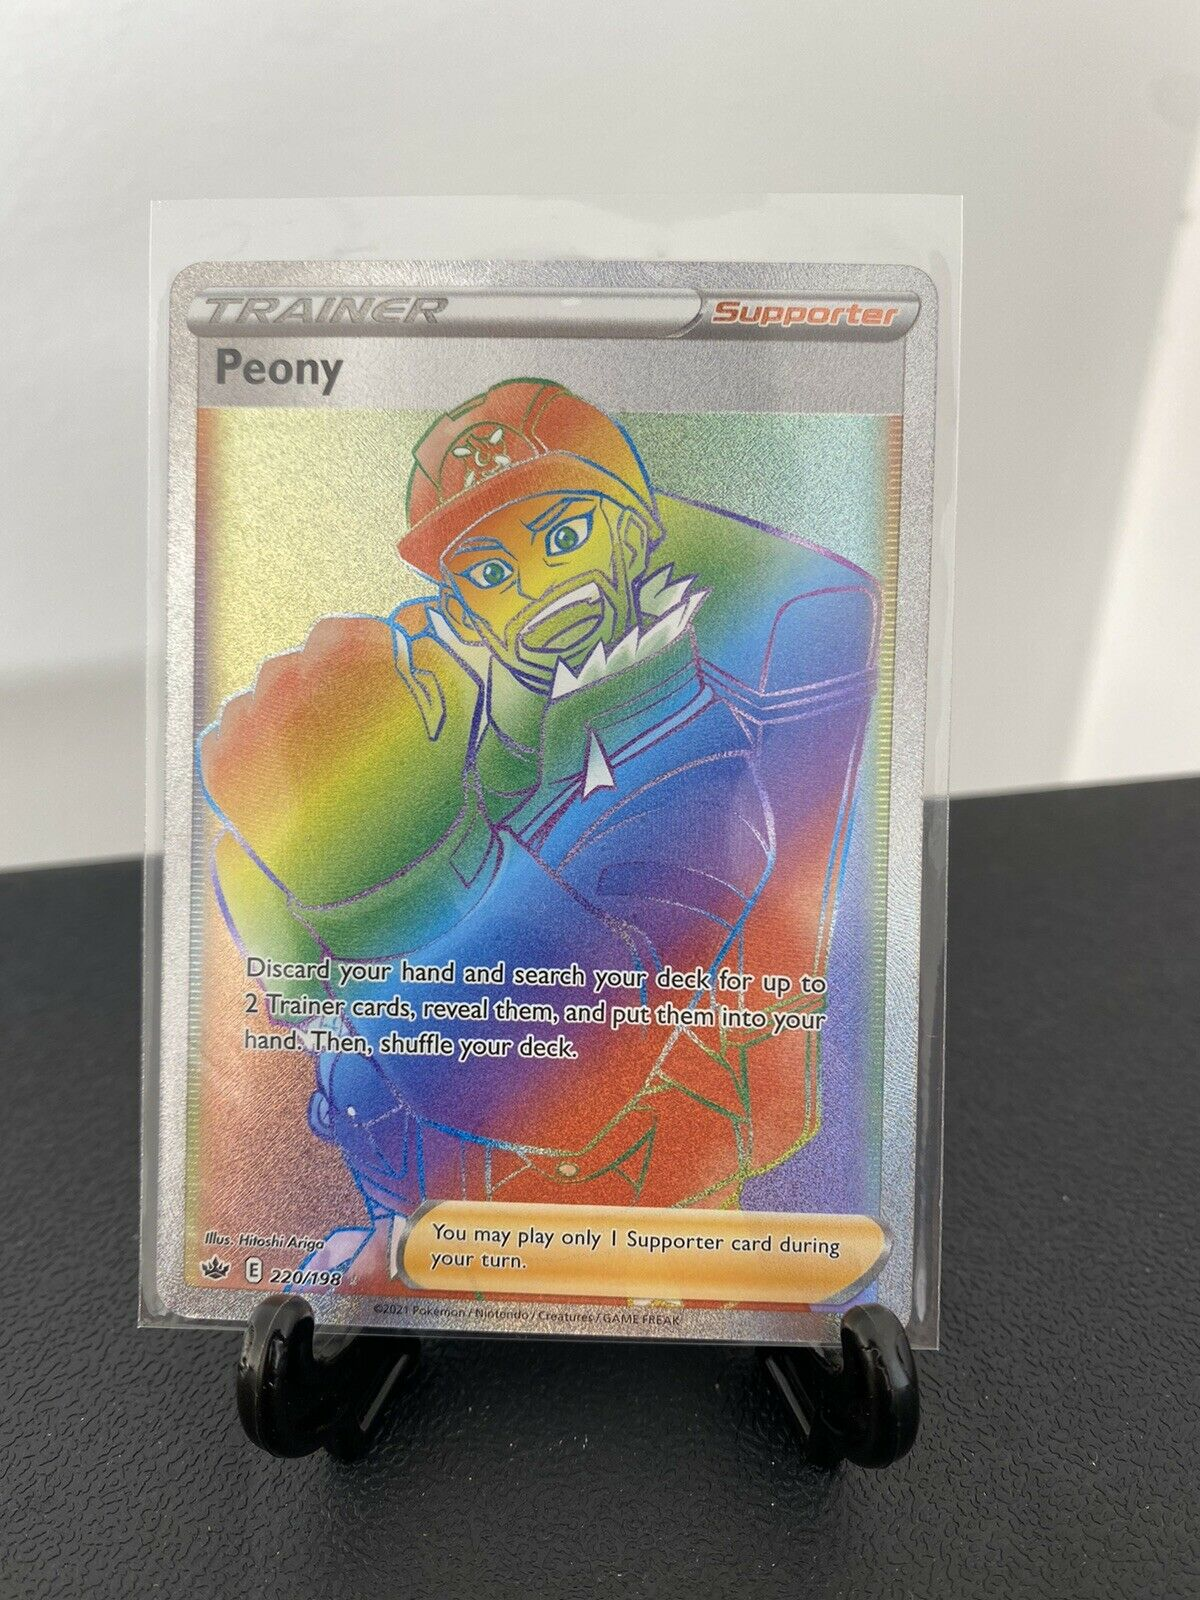 Peony Secret Rainbow Rare Pokemon Card Chilling Reign 220/198 Mint Very Centered